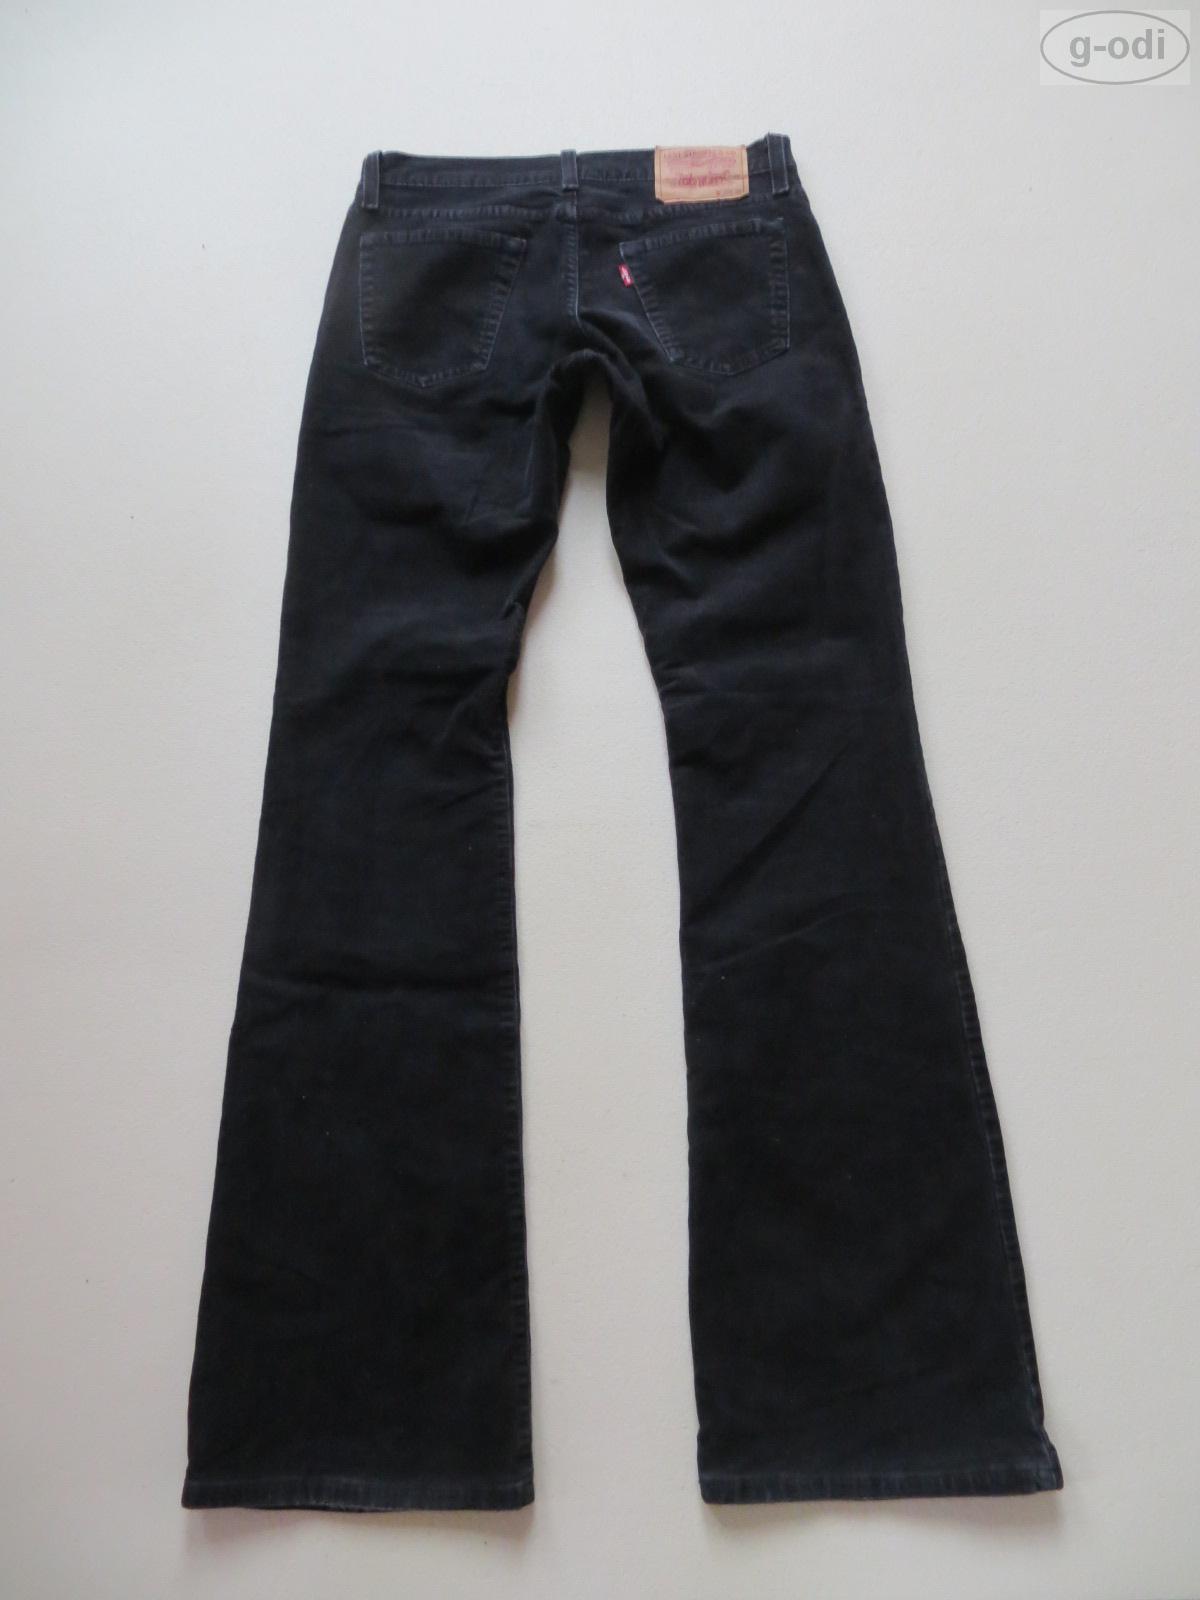 levi 39 s 529 bootcut jeans cord hose w 28 l 36 schwarz colored cordhose rar ebay. Black Bedroom Furniture Sets. Home Design Ideas